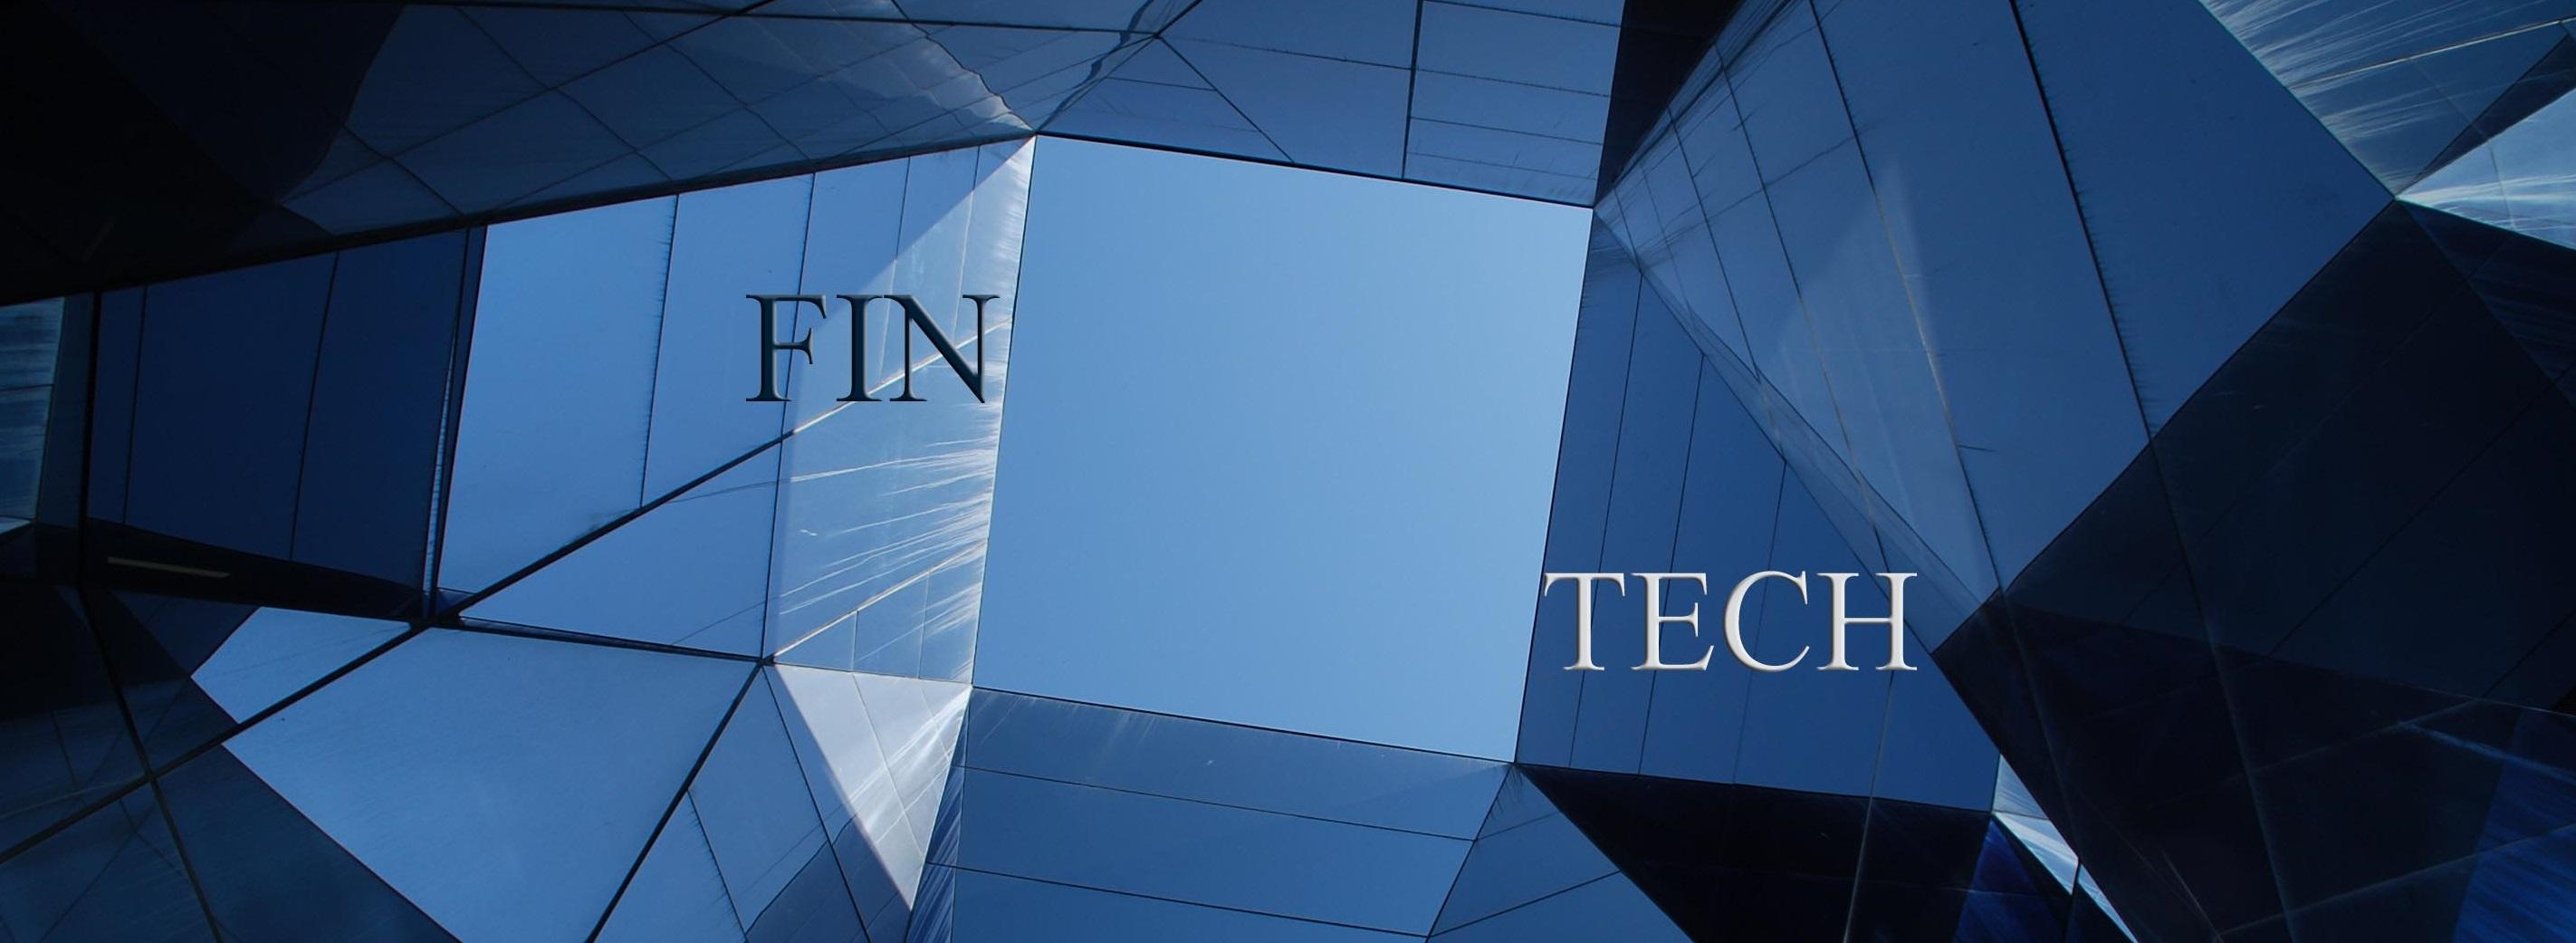 FinTech CNMV criterios OK La CNMV se aproxima a las nuevas realidades FinTech